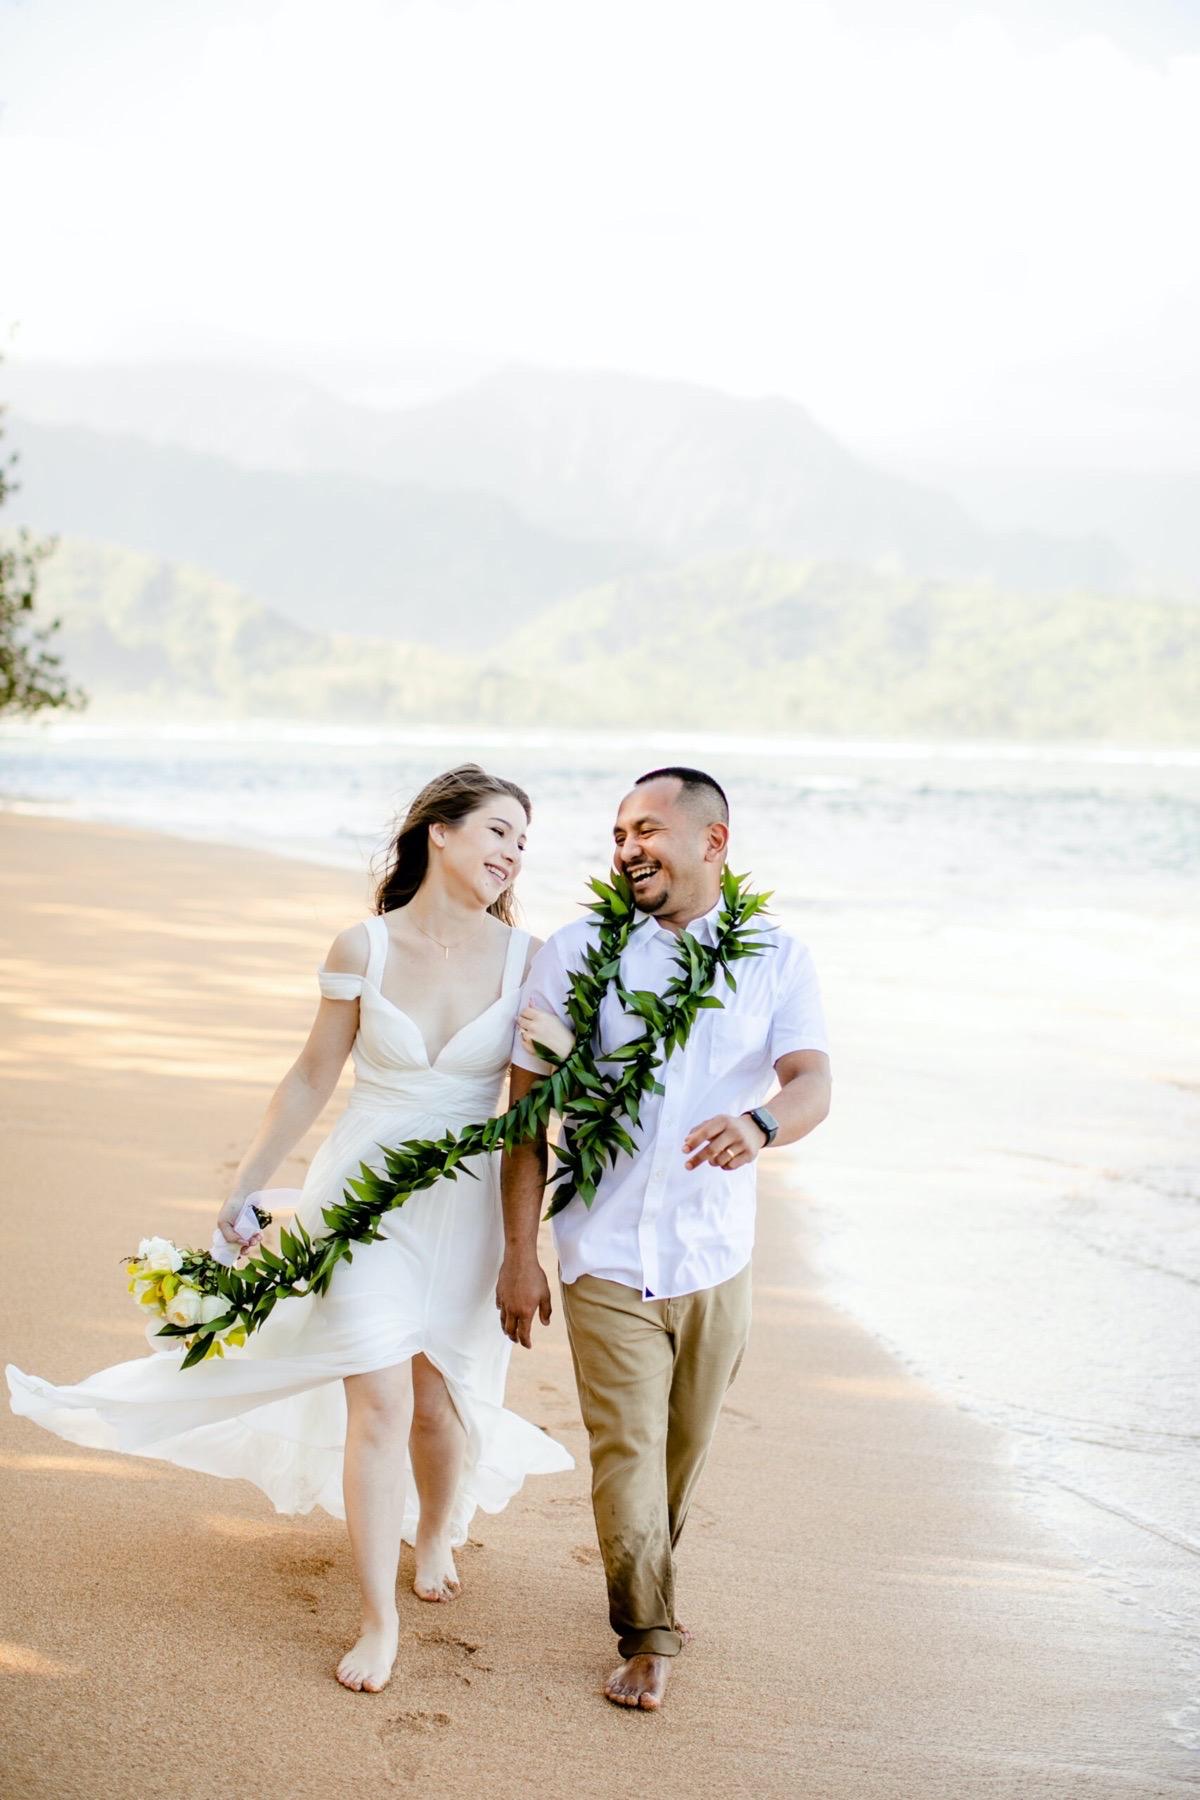 Couple walking on a beCh in Kauai.